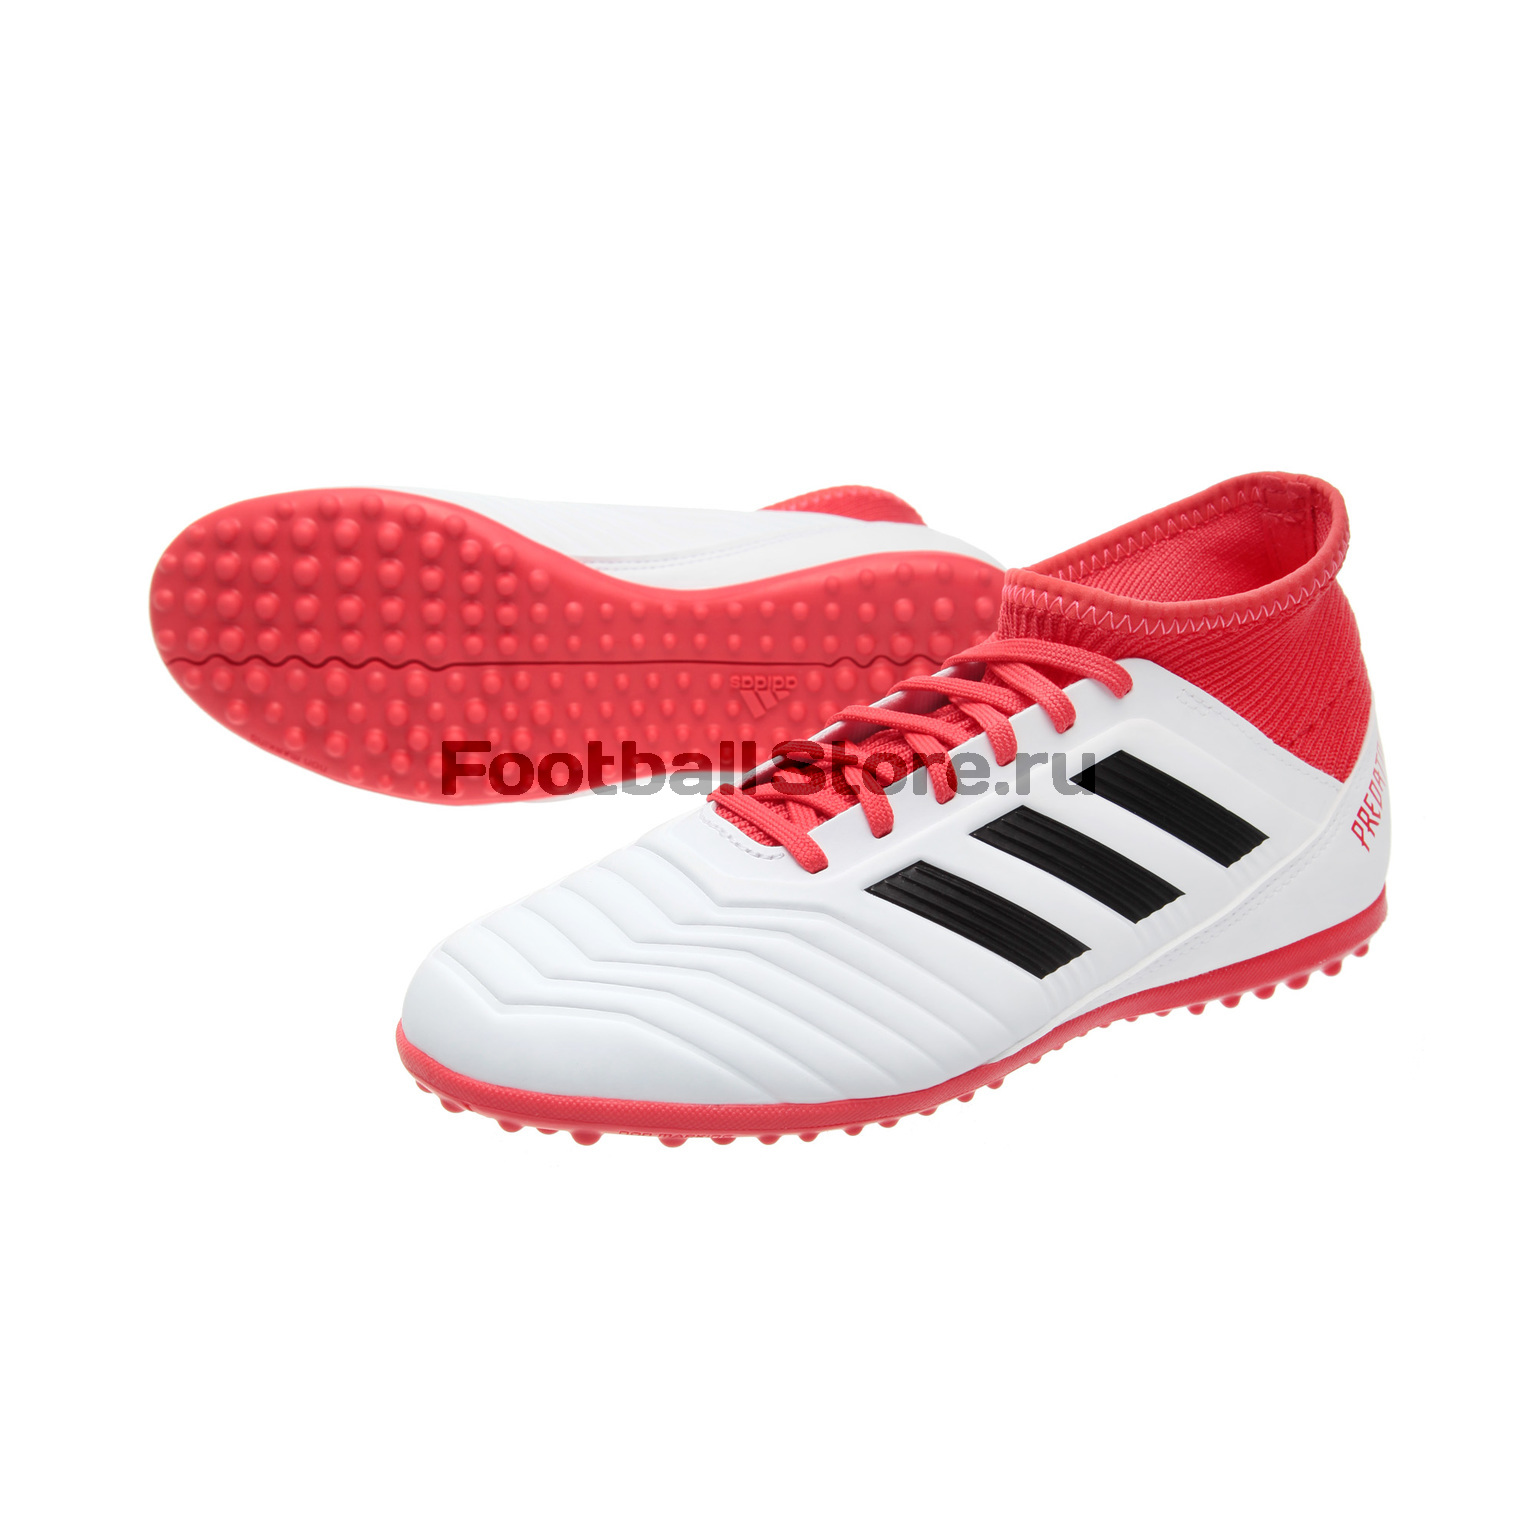 Шиповки Adidas Predator Tango 18.3 TF JR CP9040 adidas predator junior gk glove